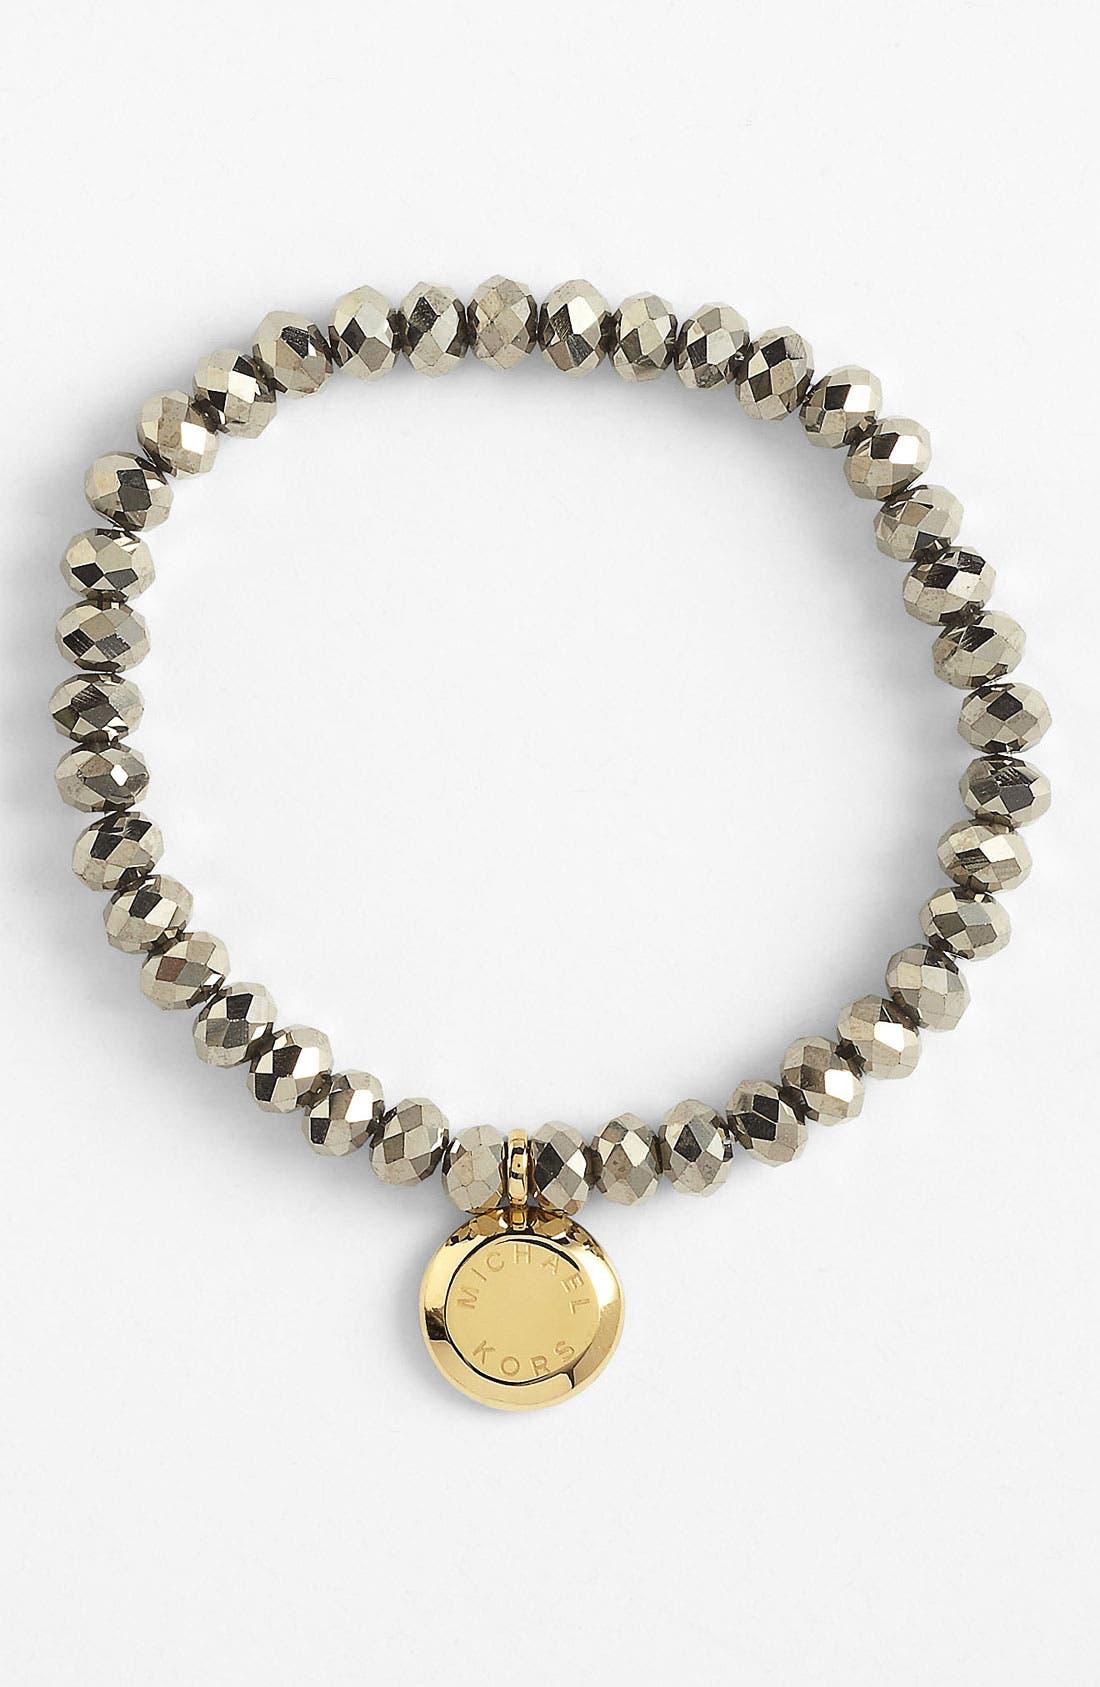 Main Image - Michael Kors 'Brilliance' Charm Bead Stretch Bracelet